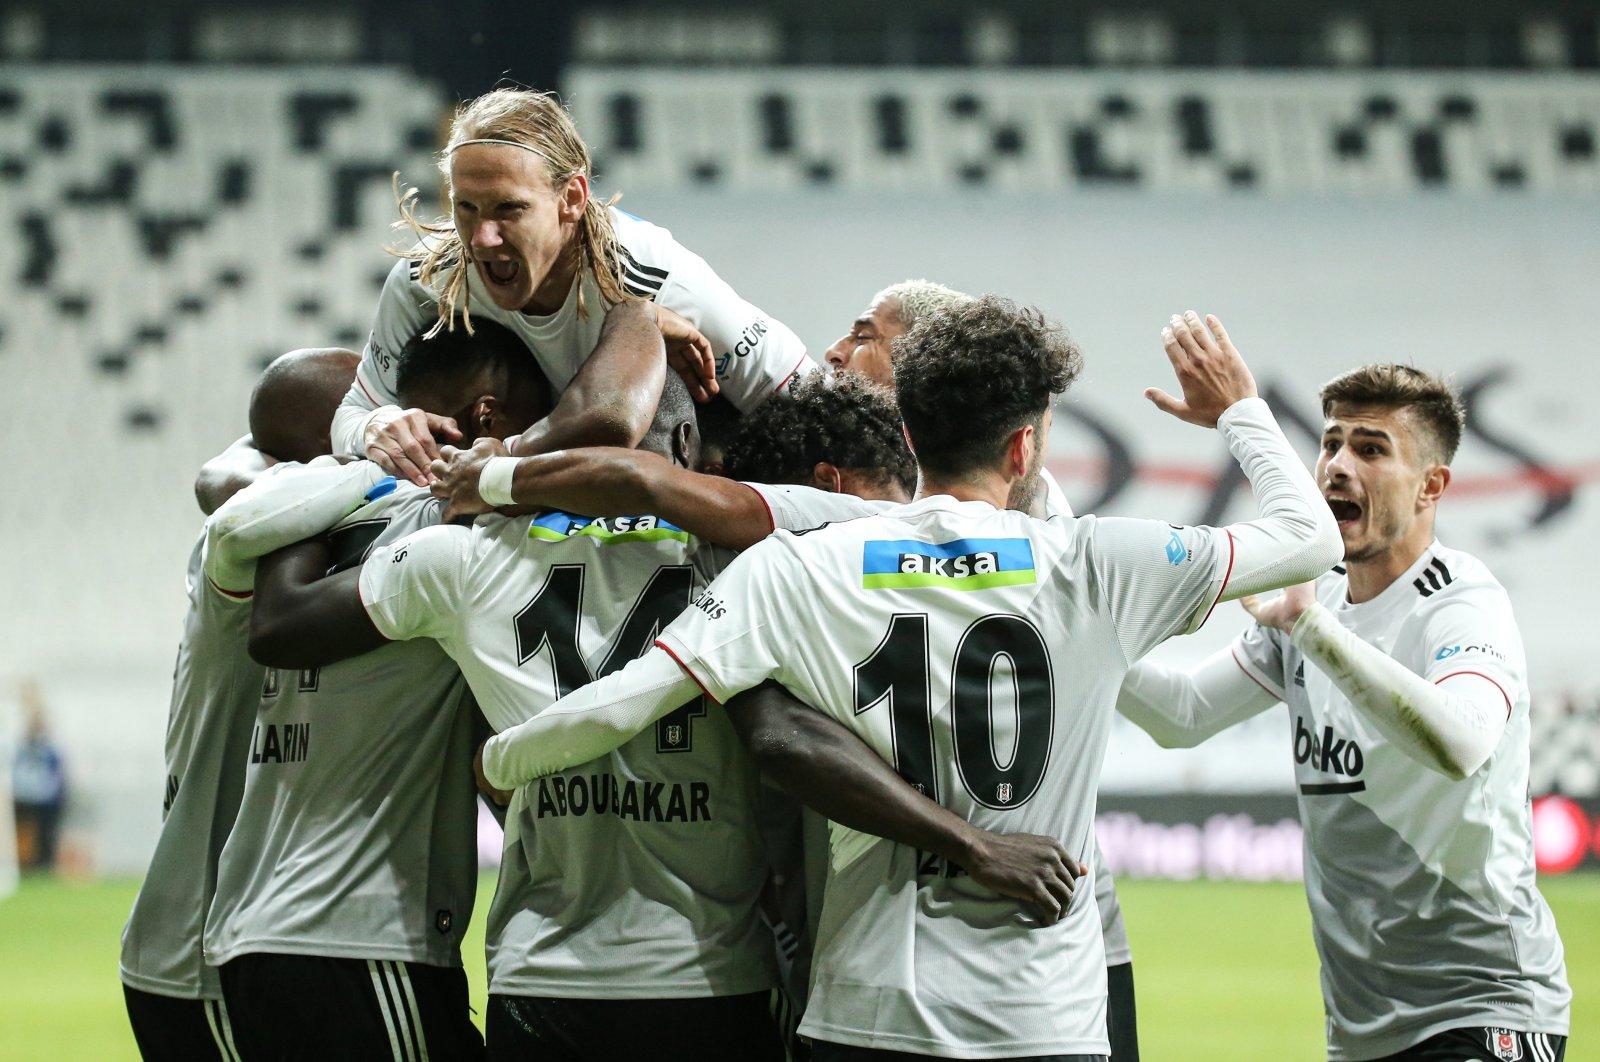 Beşiktaş players celebrate a goal during a Süper Lig match against Malatyaspor, in Istanbul, Turkey, Nov. 2, 2020. (AA Photo)